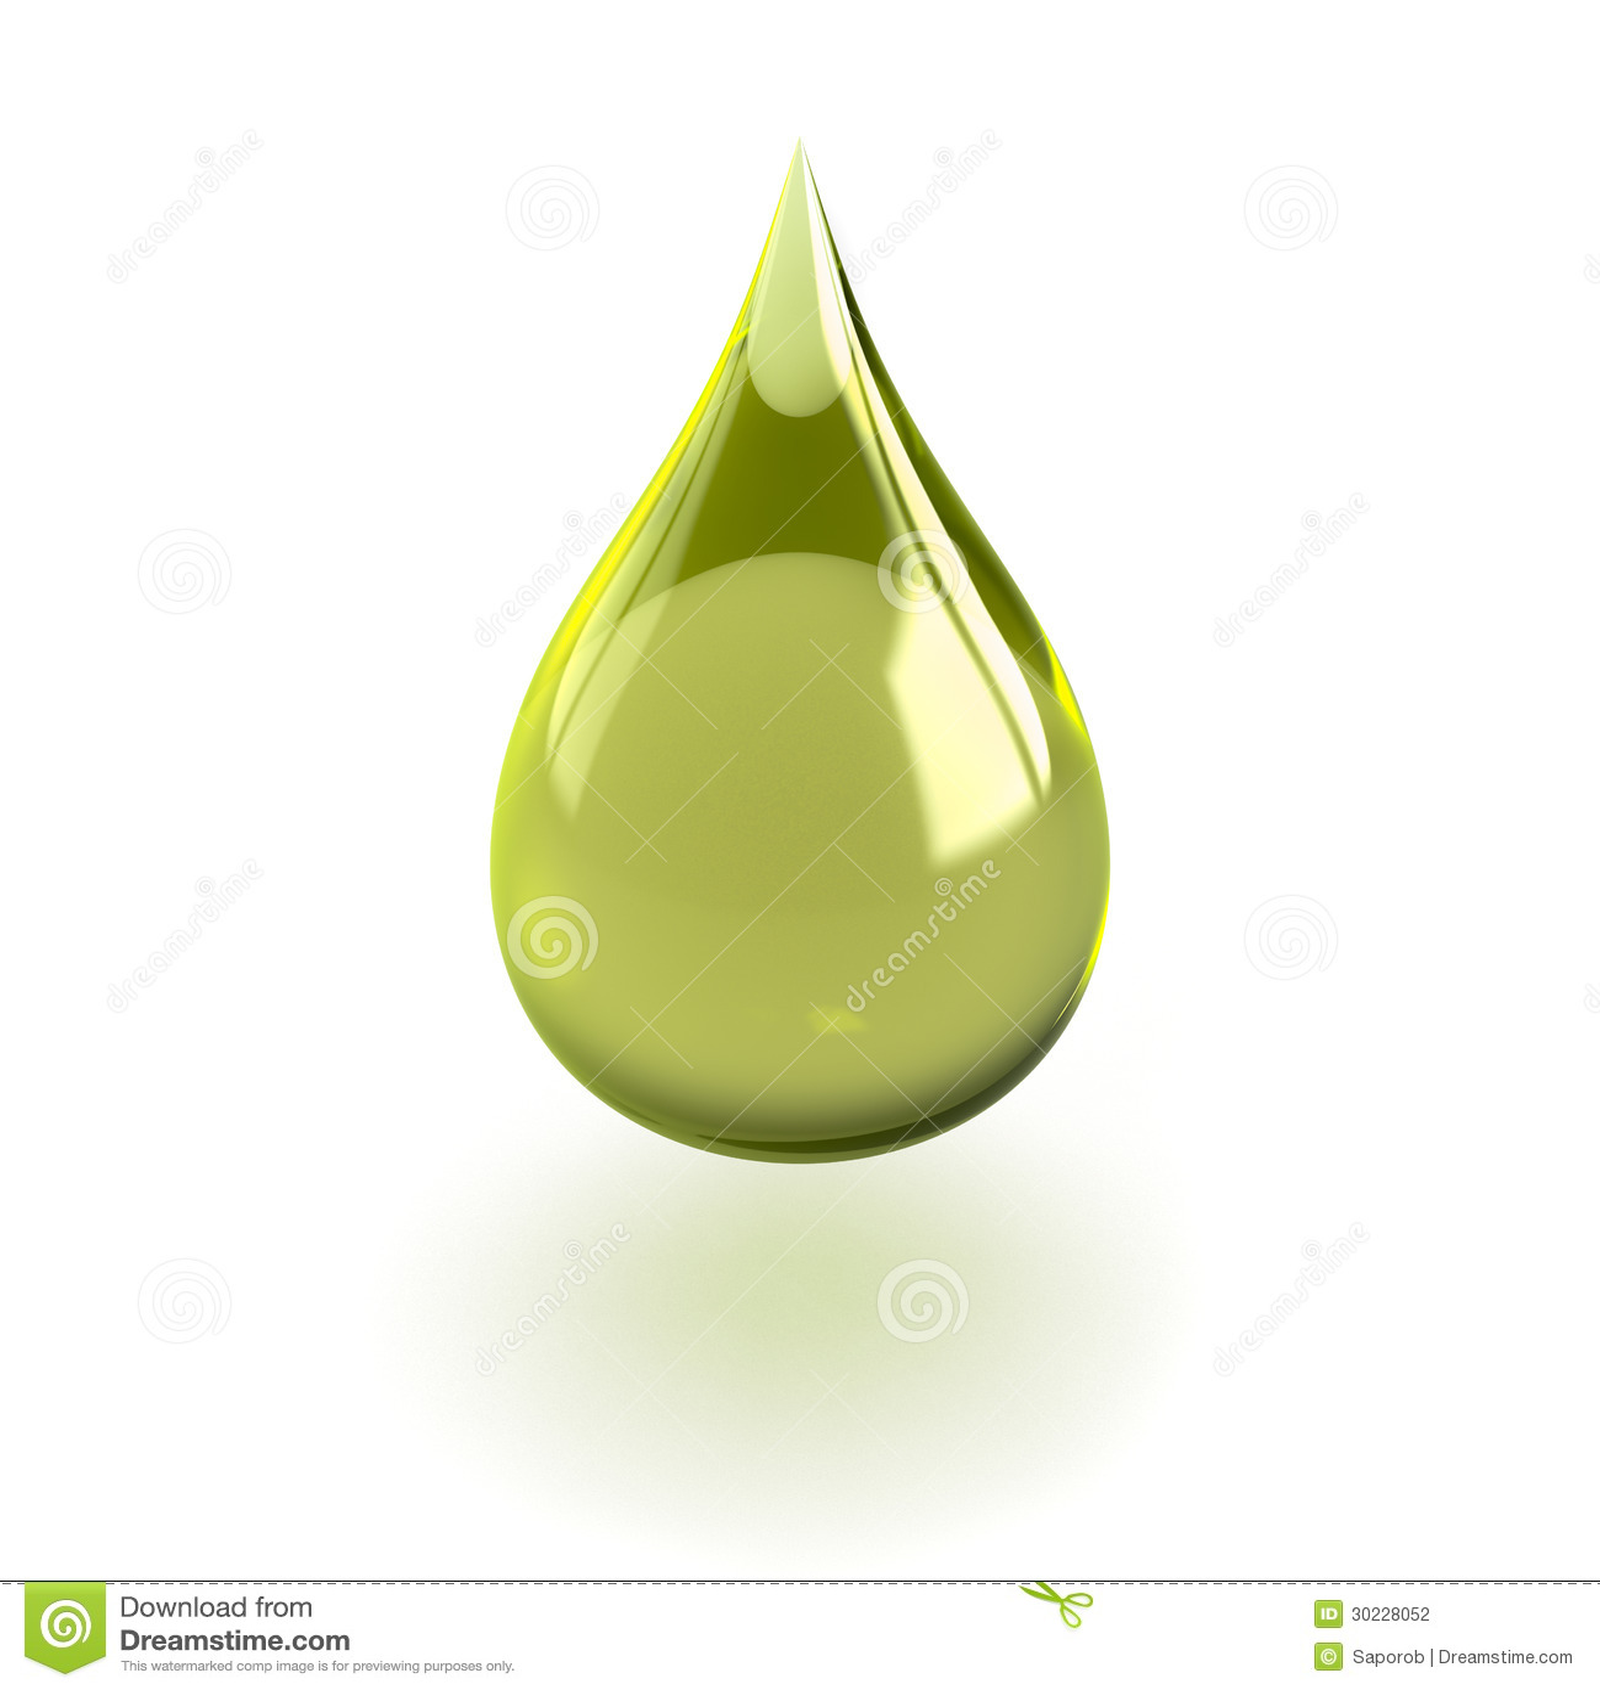 oil drop stock photography image 30228052 cartoon water droplet clipart water droplet clipart outline